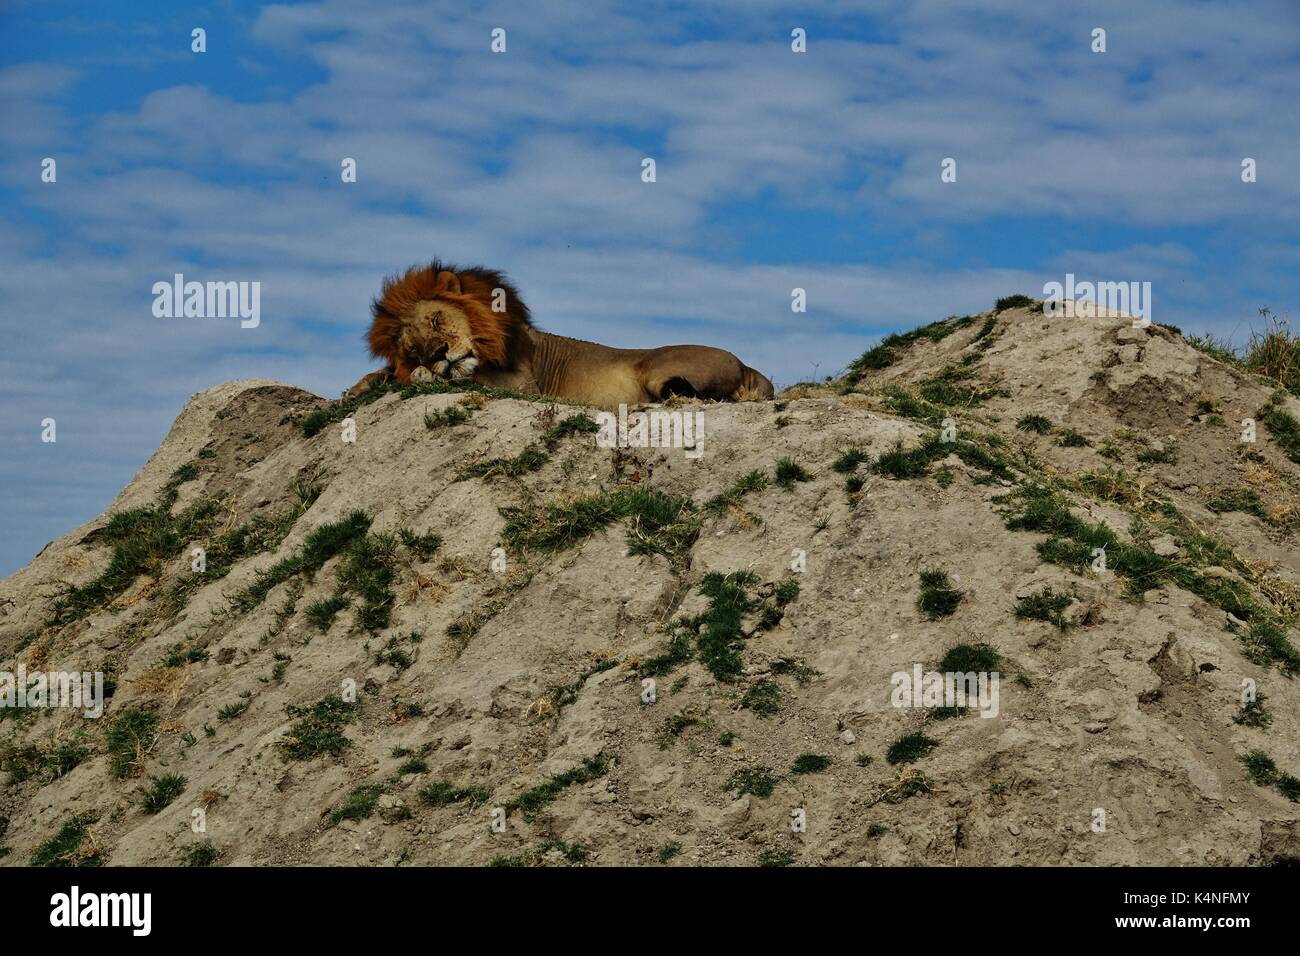 Lion sleeping on hill - Stock Image